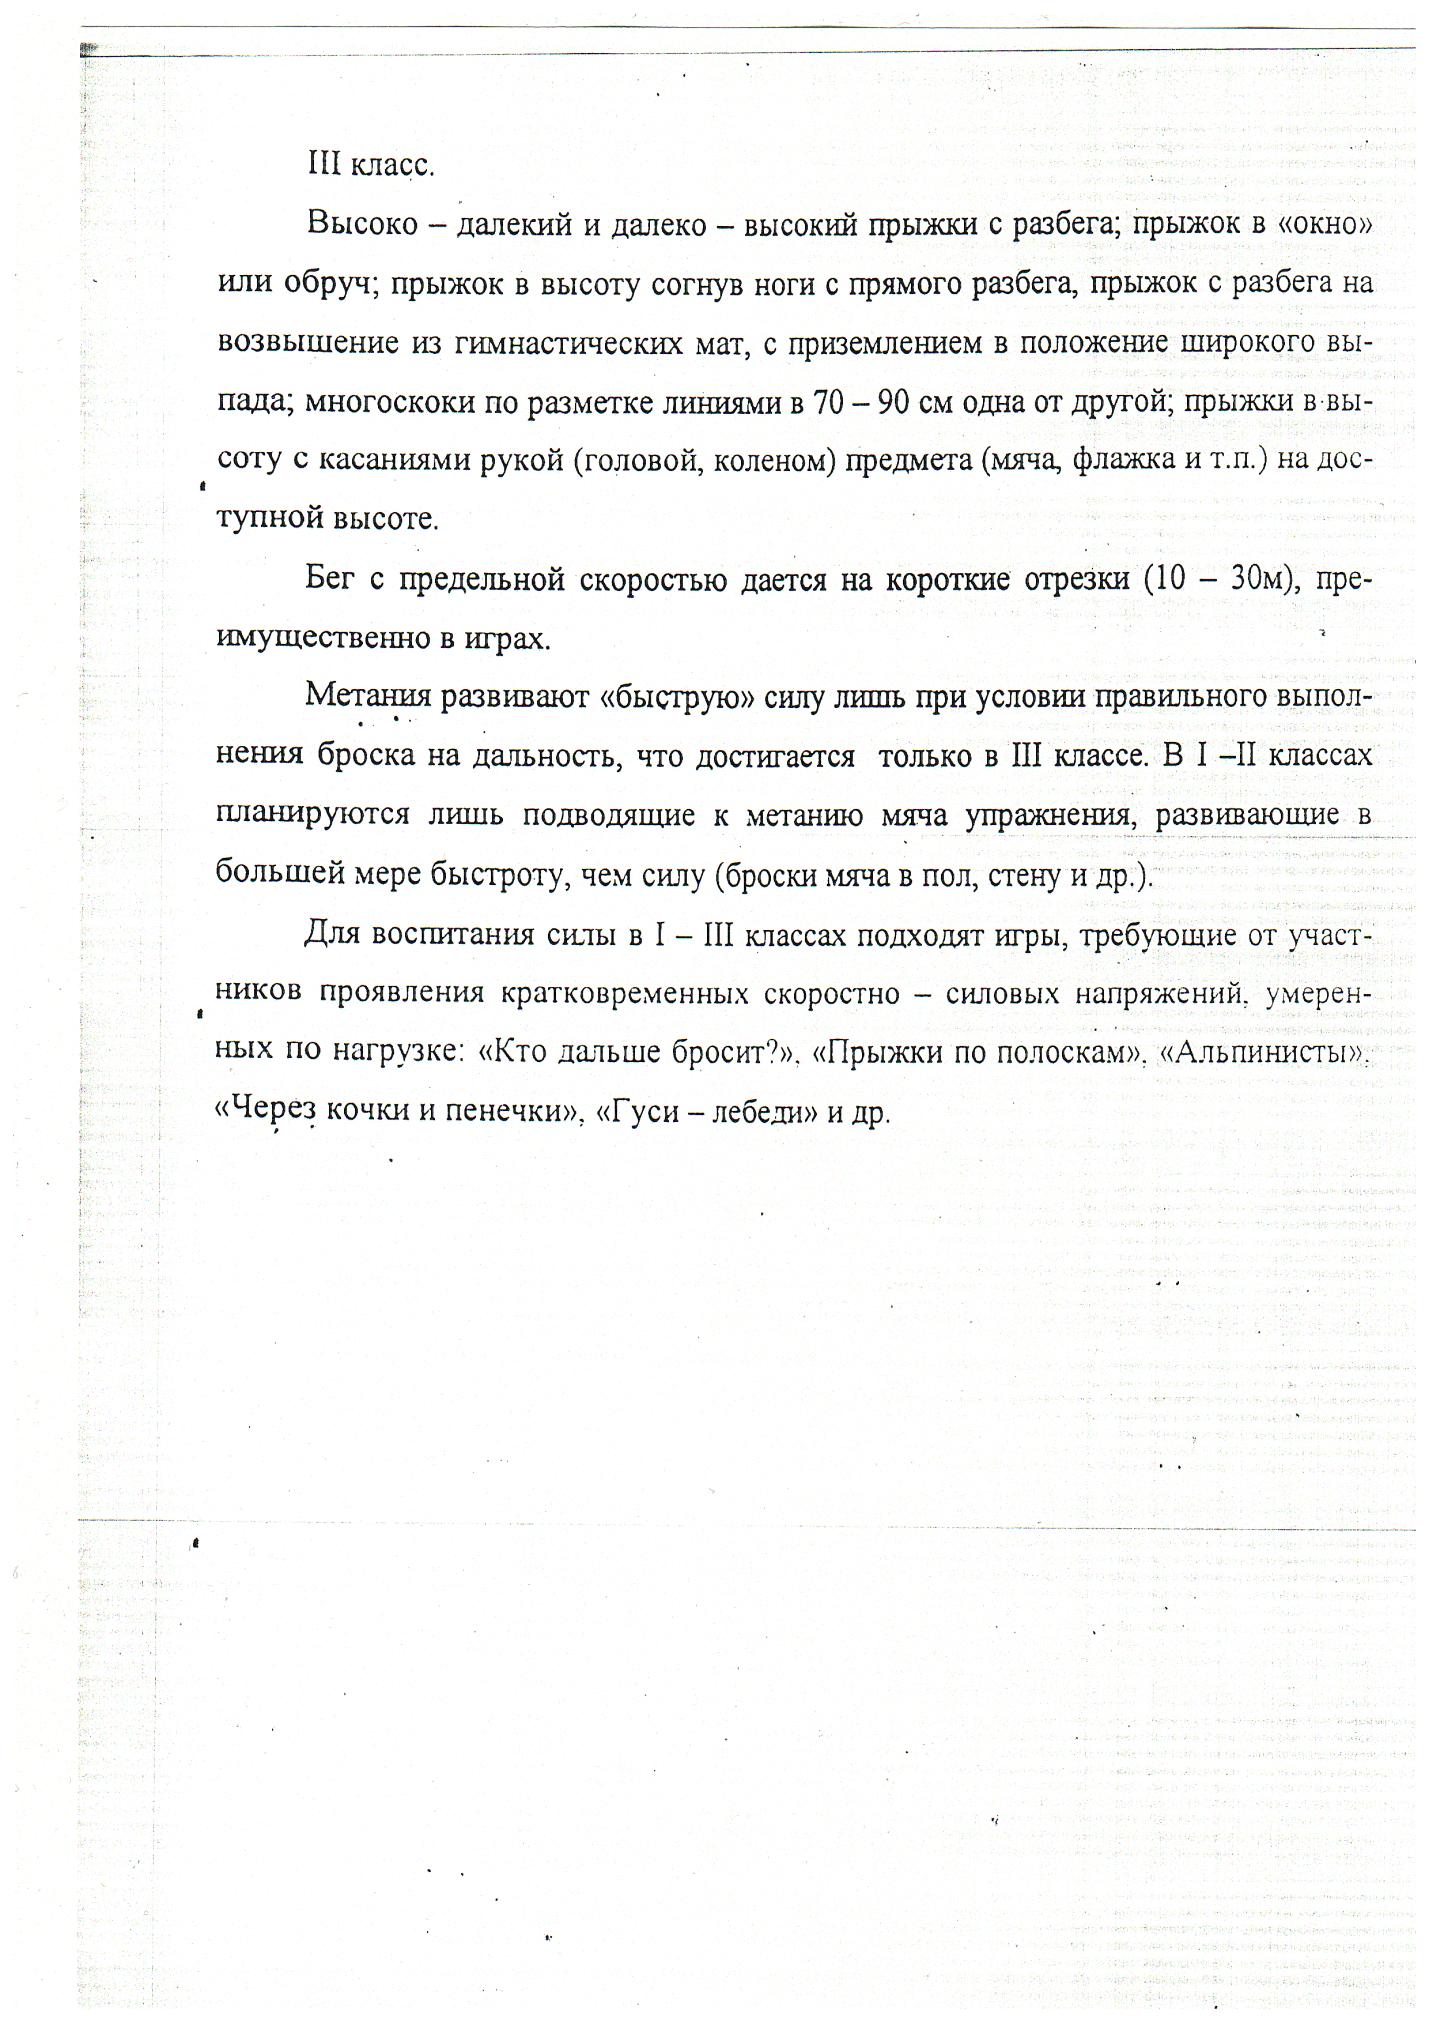 C:\Users\Татьяна\Desktop\10 001.BMP